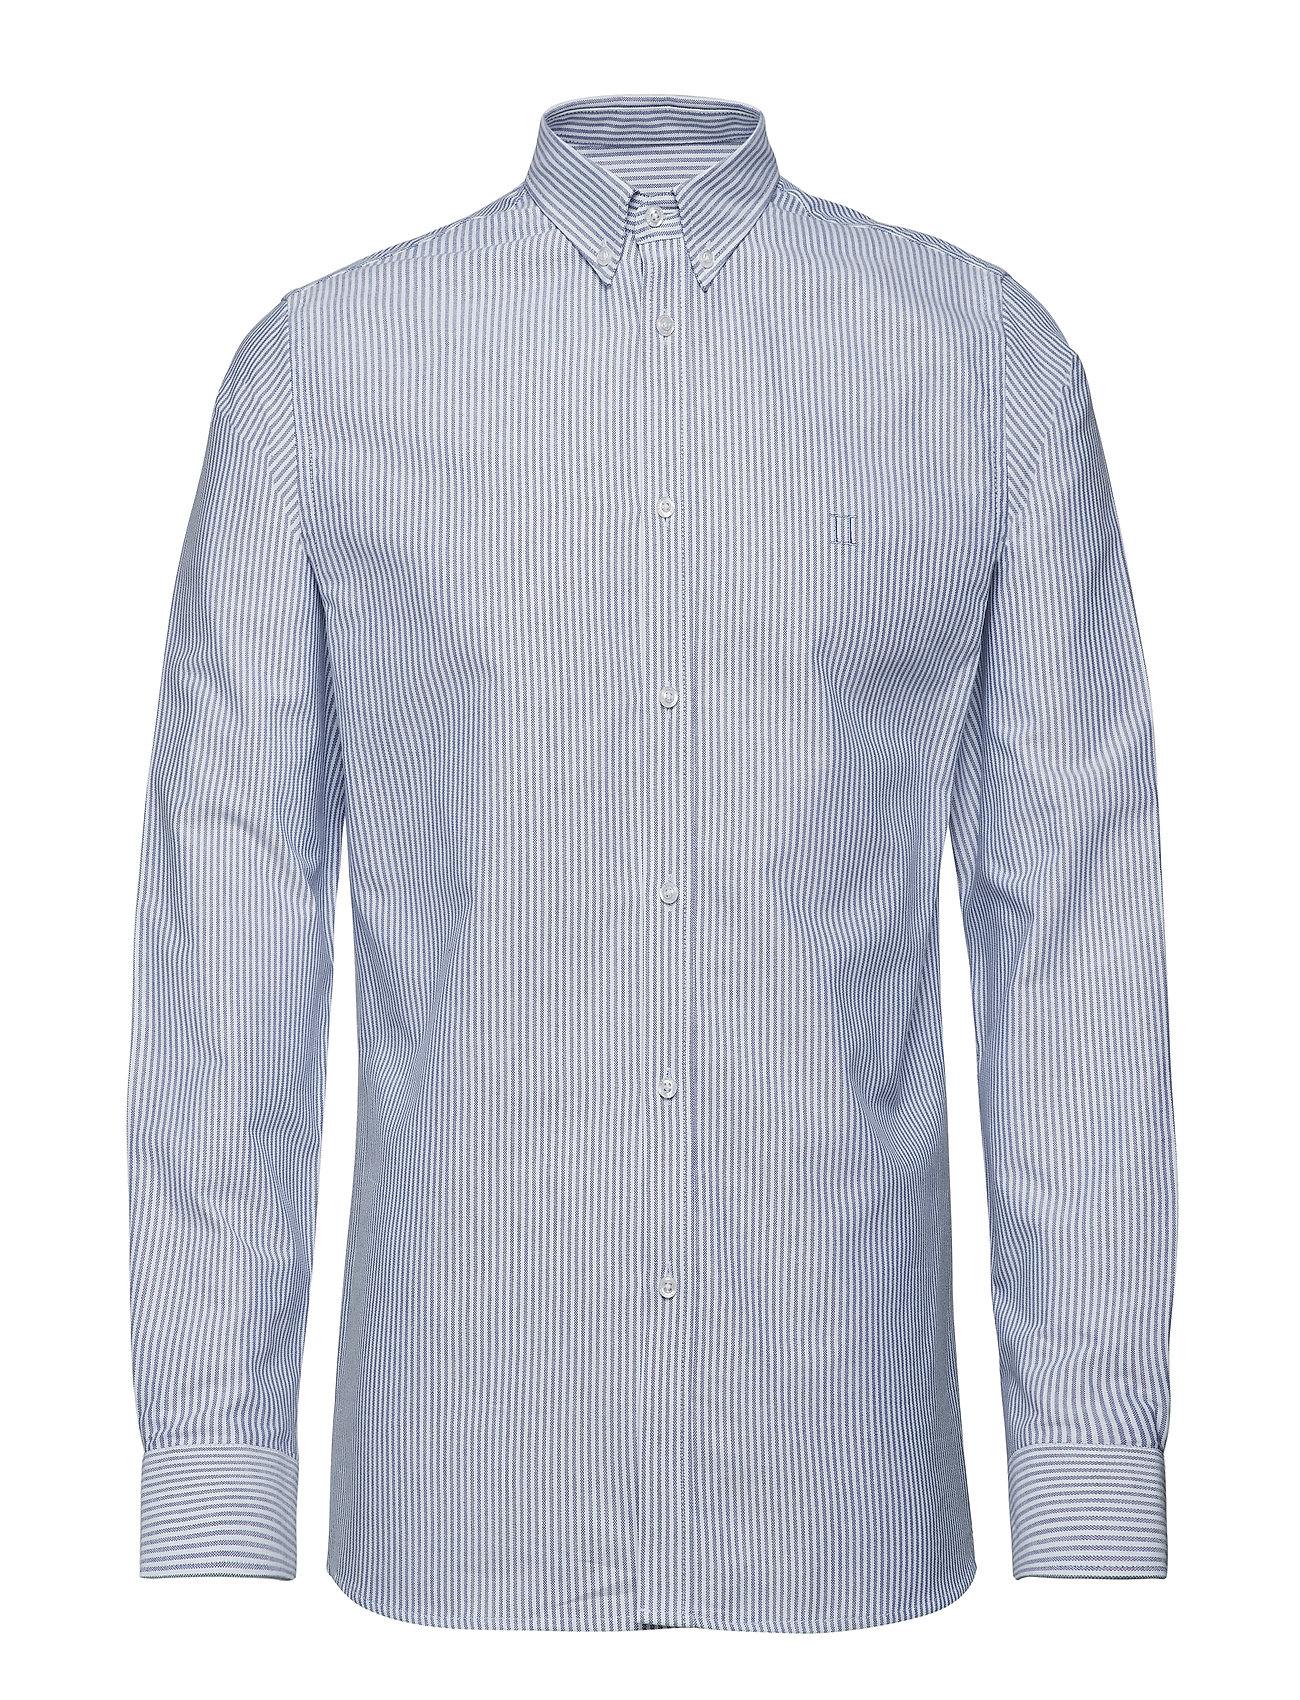 Les Deux Christoph Oxford Shirt - STRIPE DARK NAVY